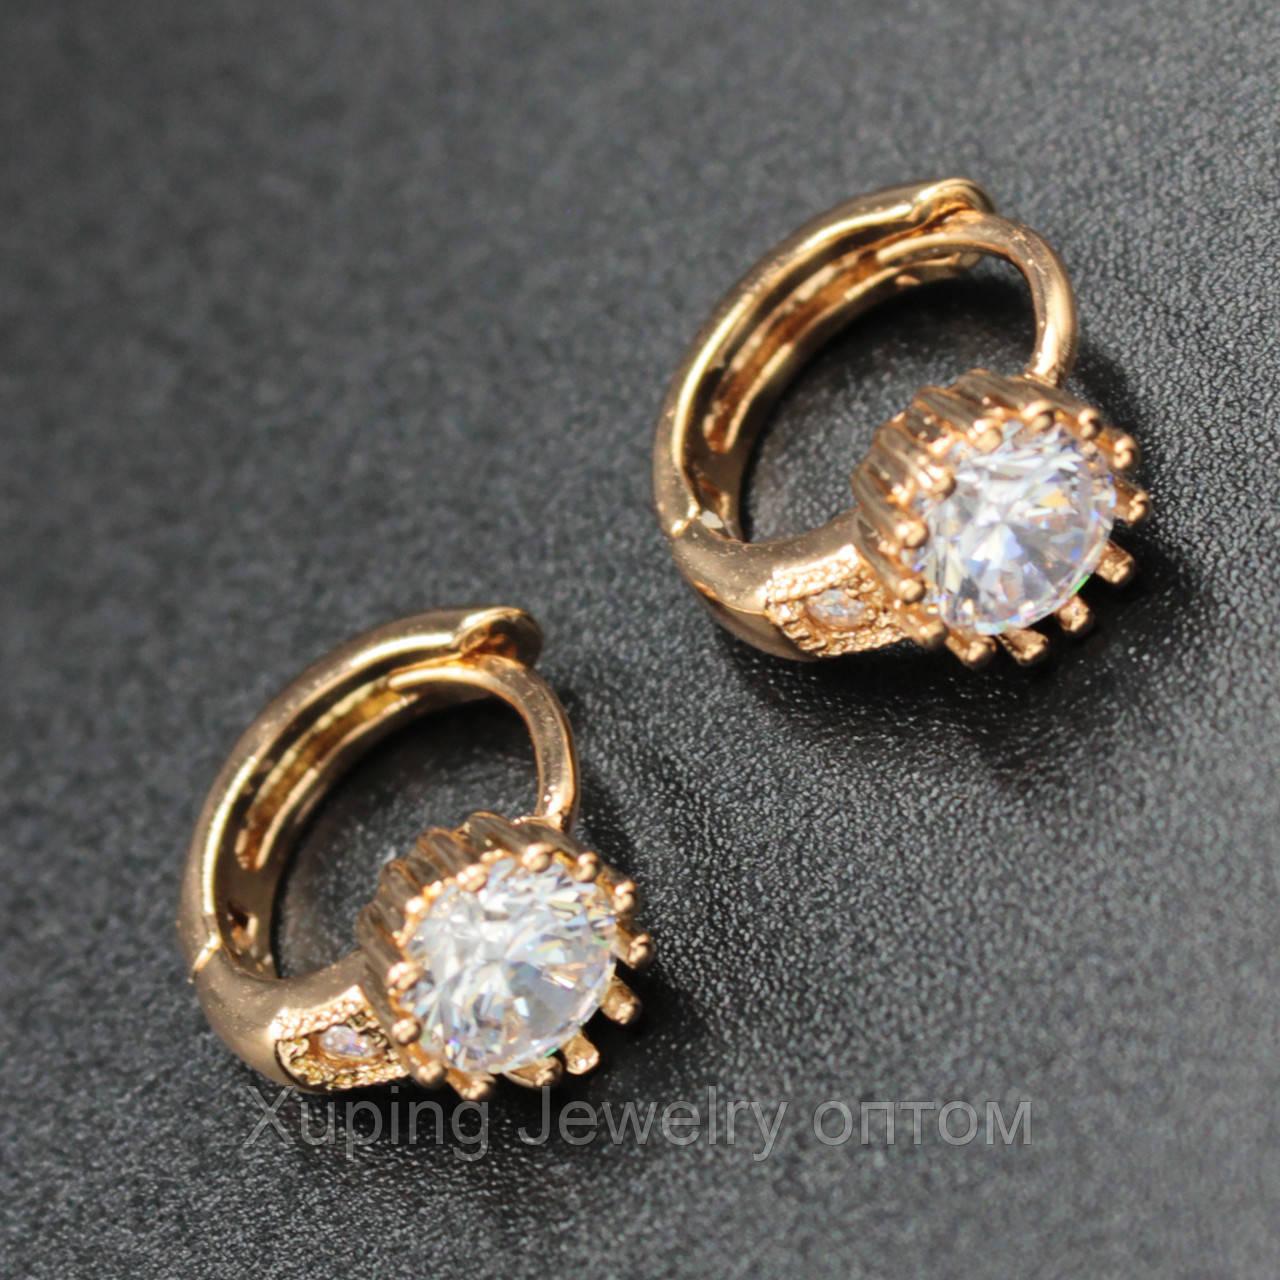 "Серьги женские "" Nellie"" Xuping Jewelry (позолота)."